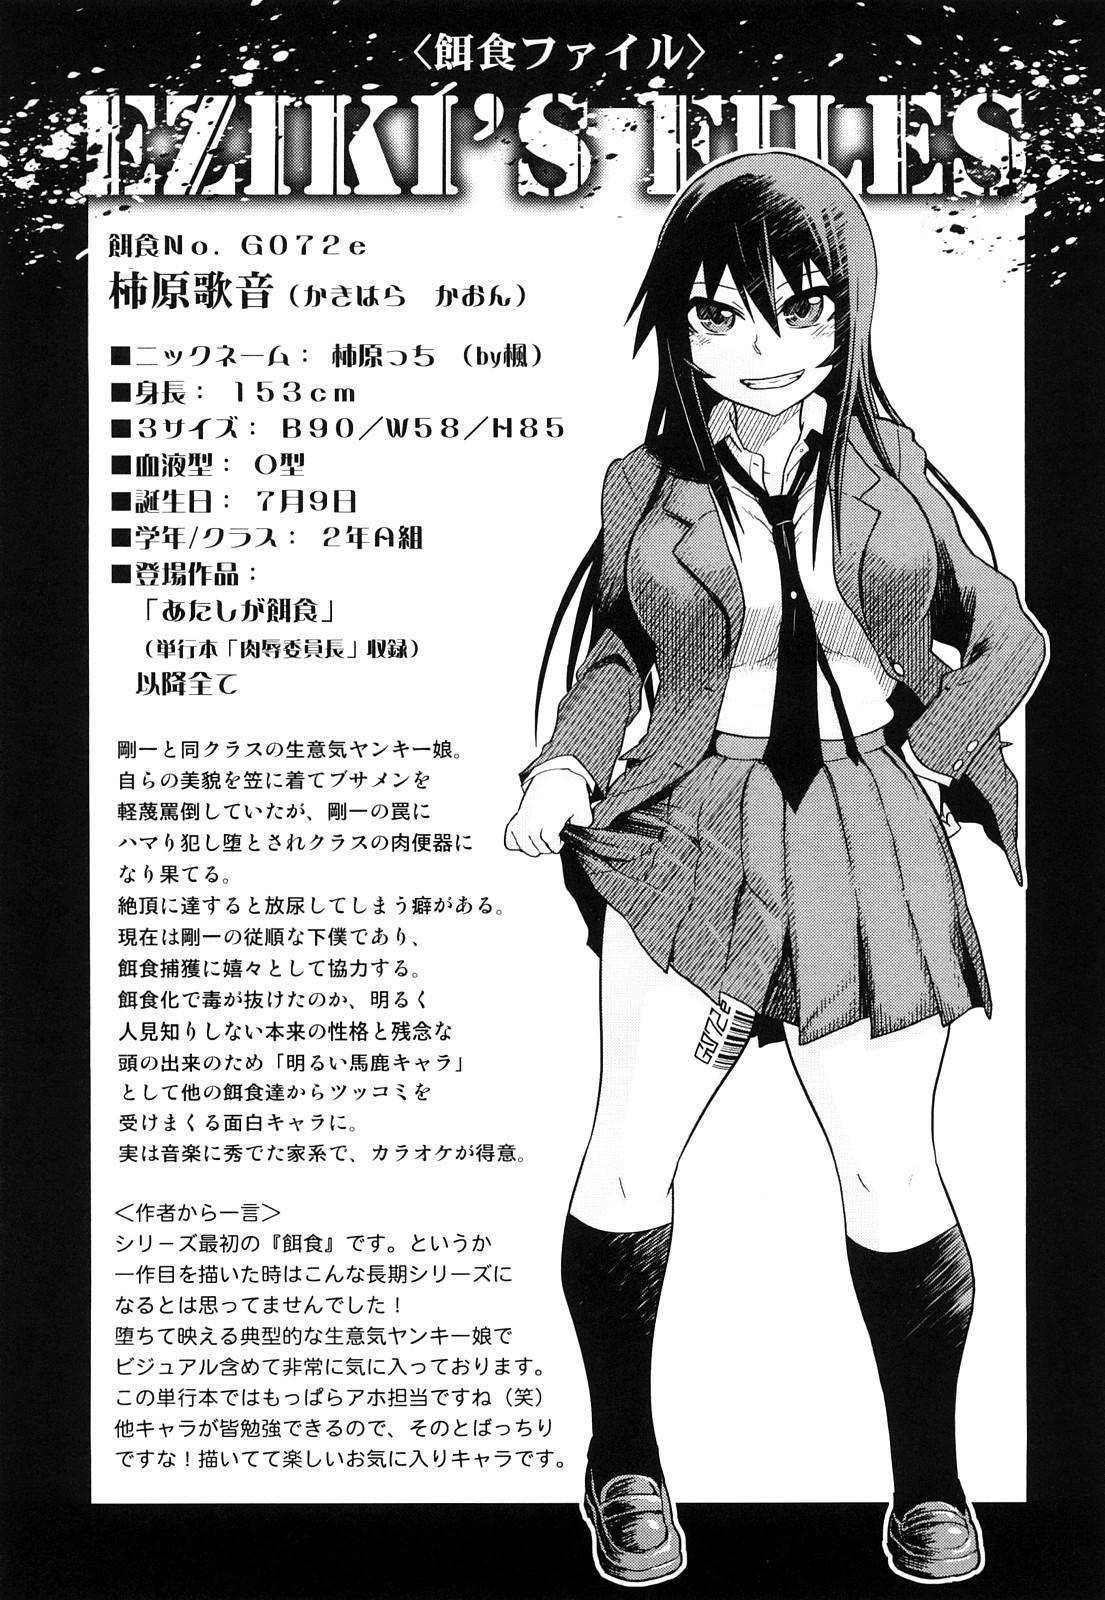 Seifuku Mesubuta Chitai - The Nymphomaniac Zone 27